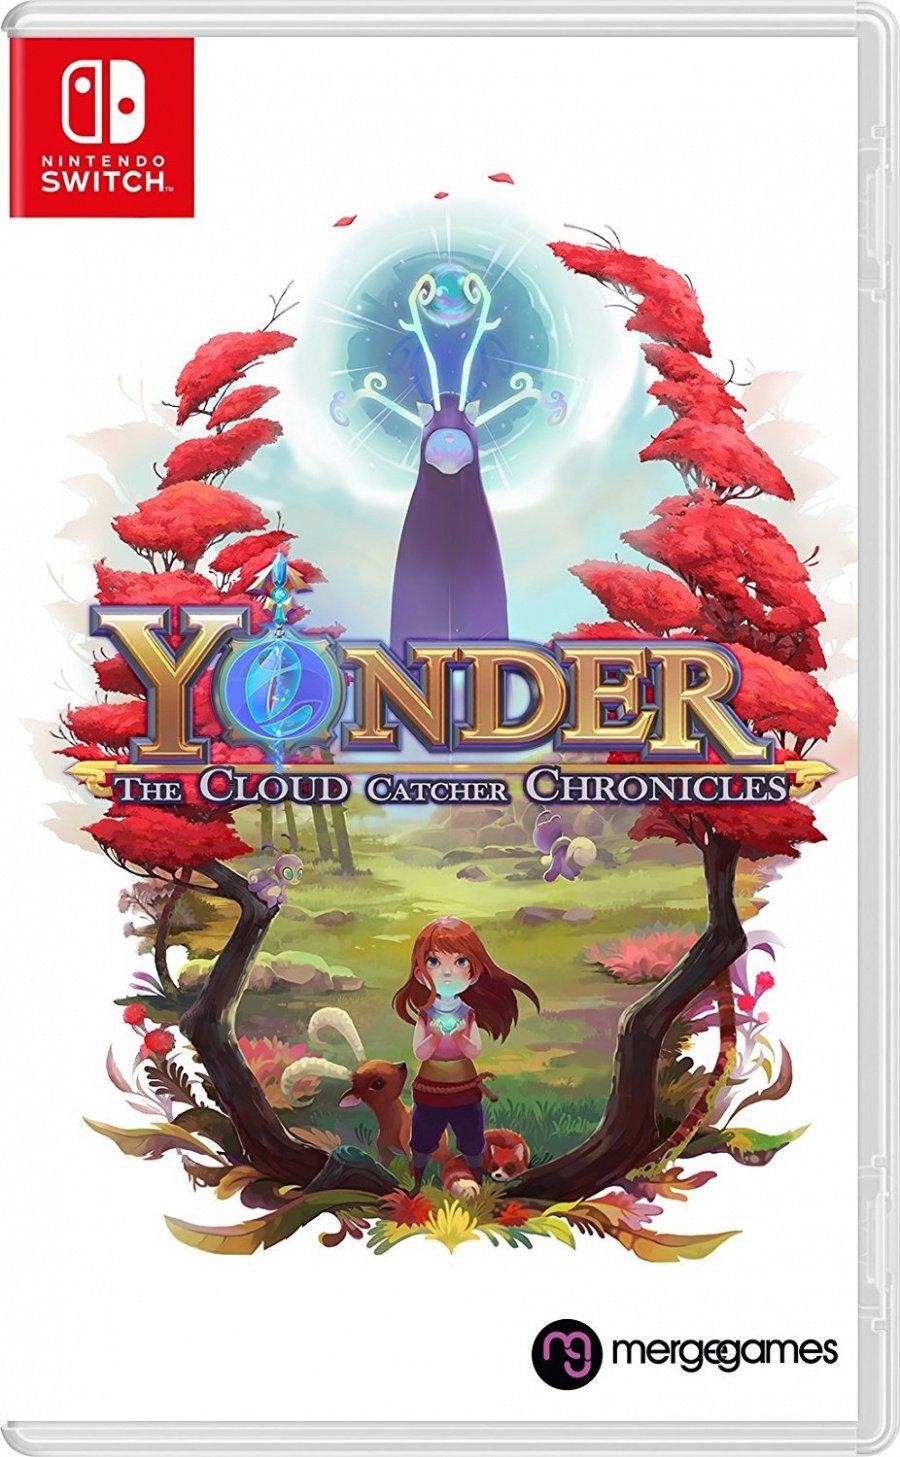 Yonder-The-Cloud-Catcher-Chronicles.jpg